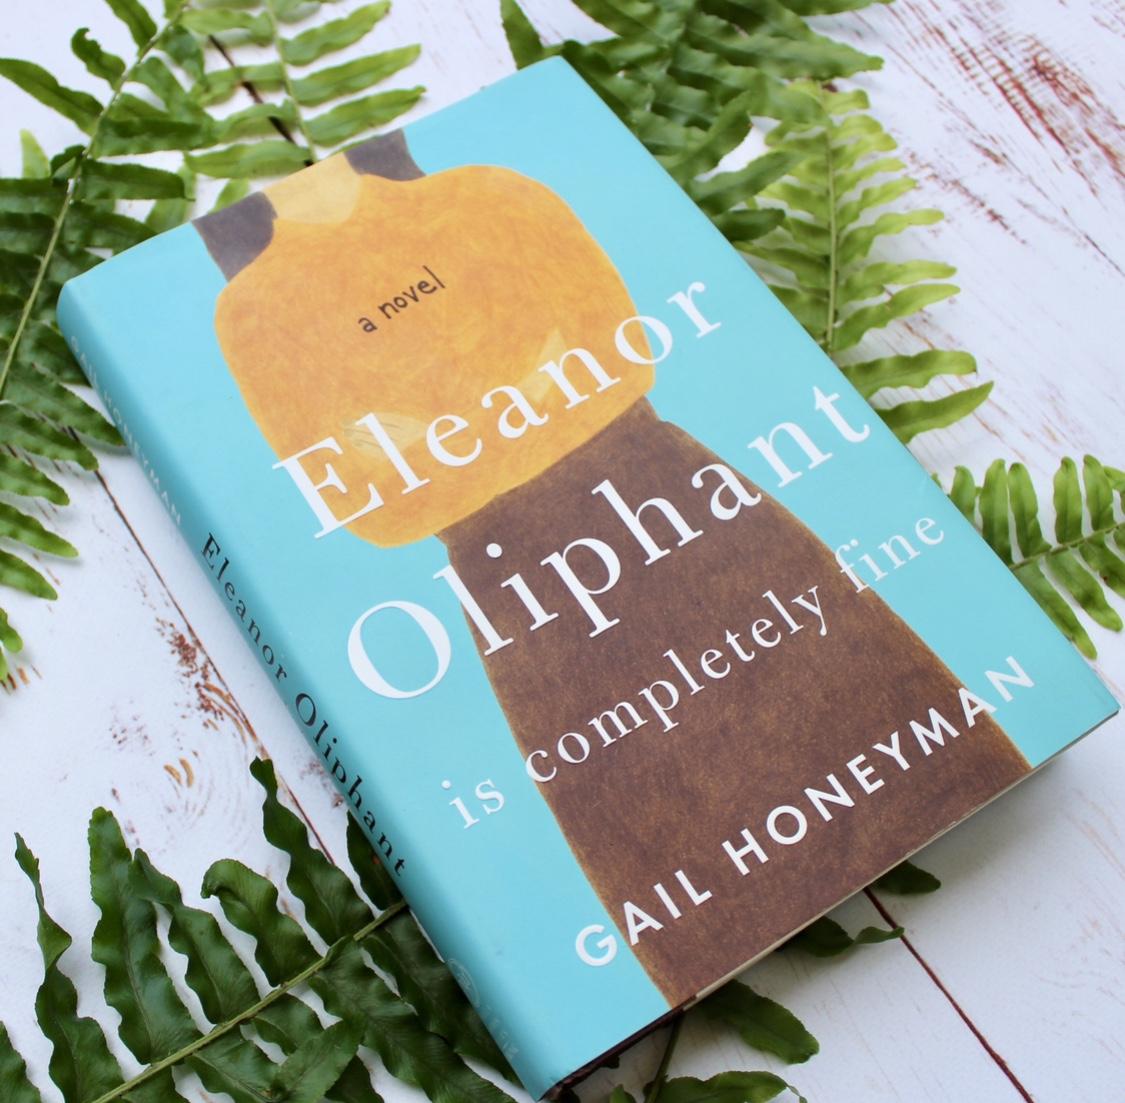 eleanor oliphant.jpg